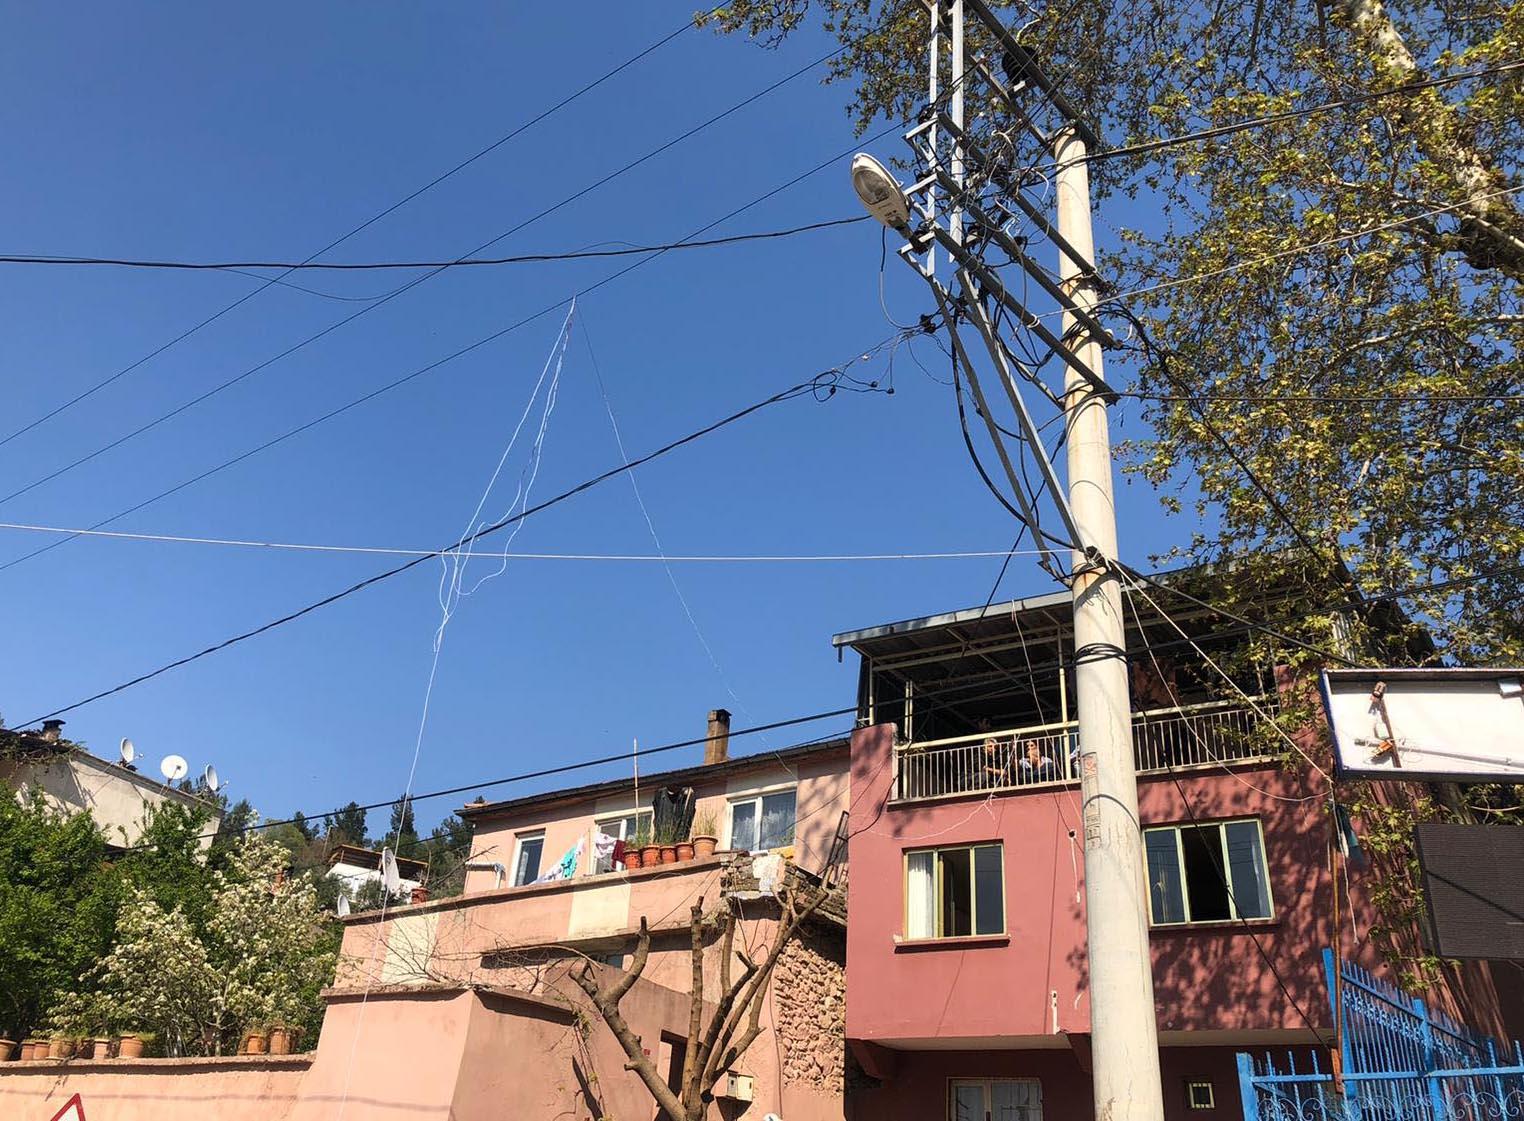 Elektrik trafosu patladı: 1 yaralı